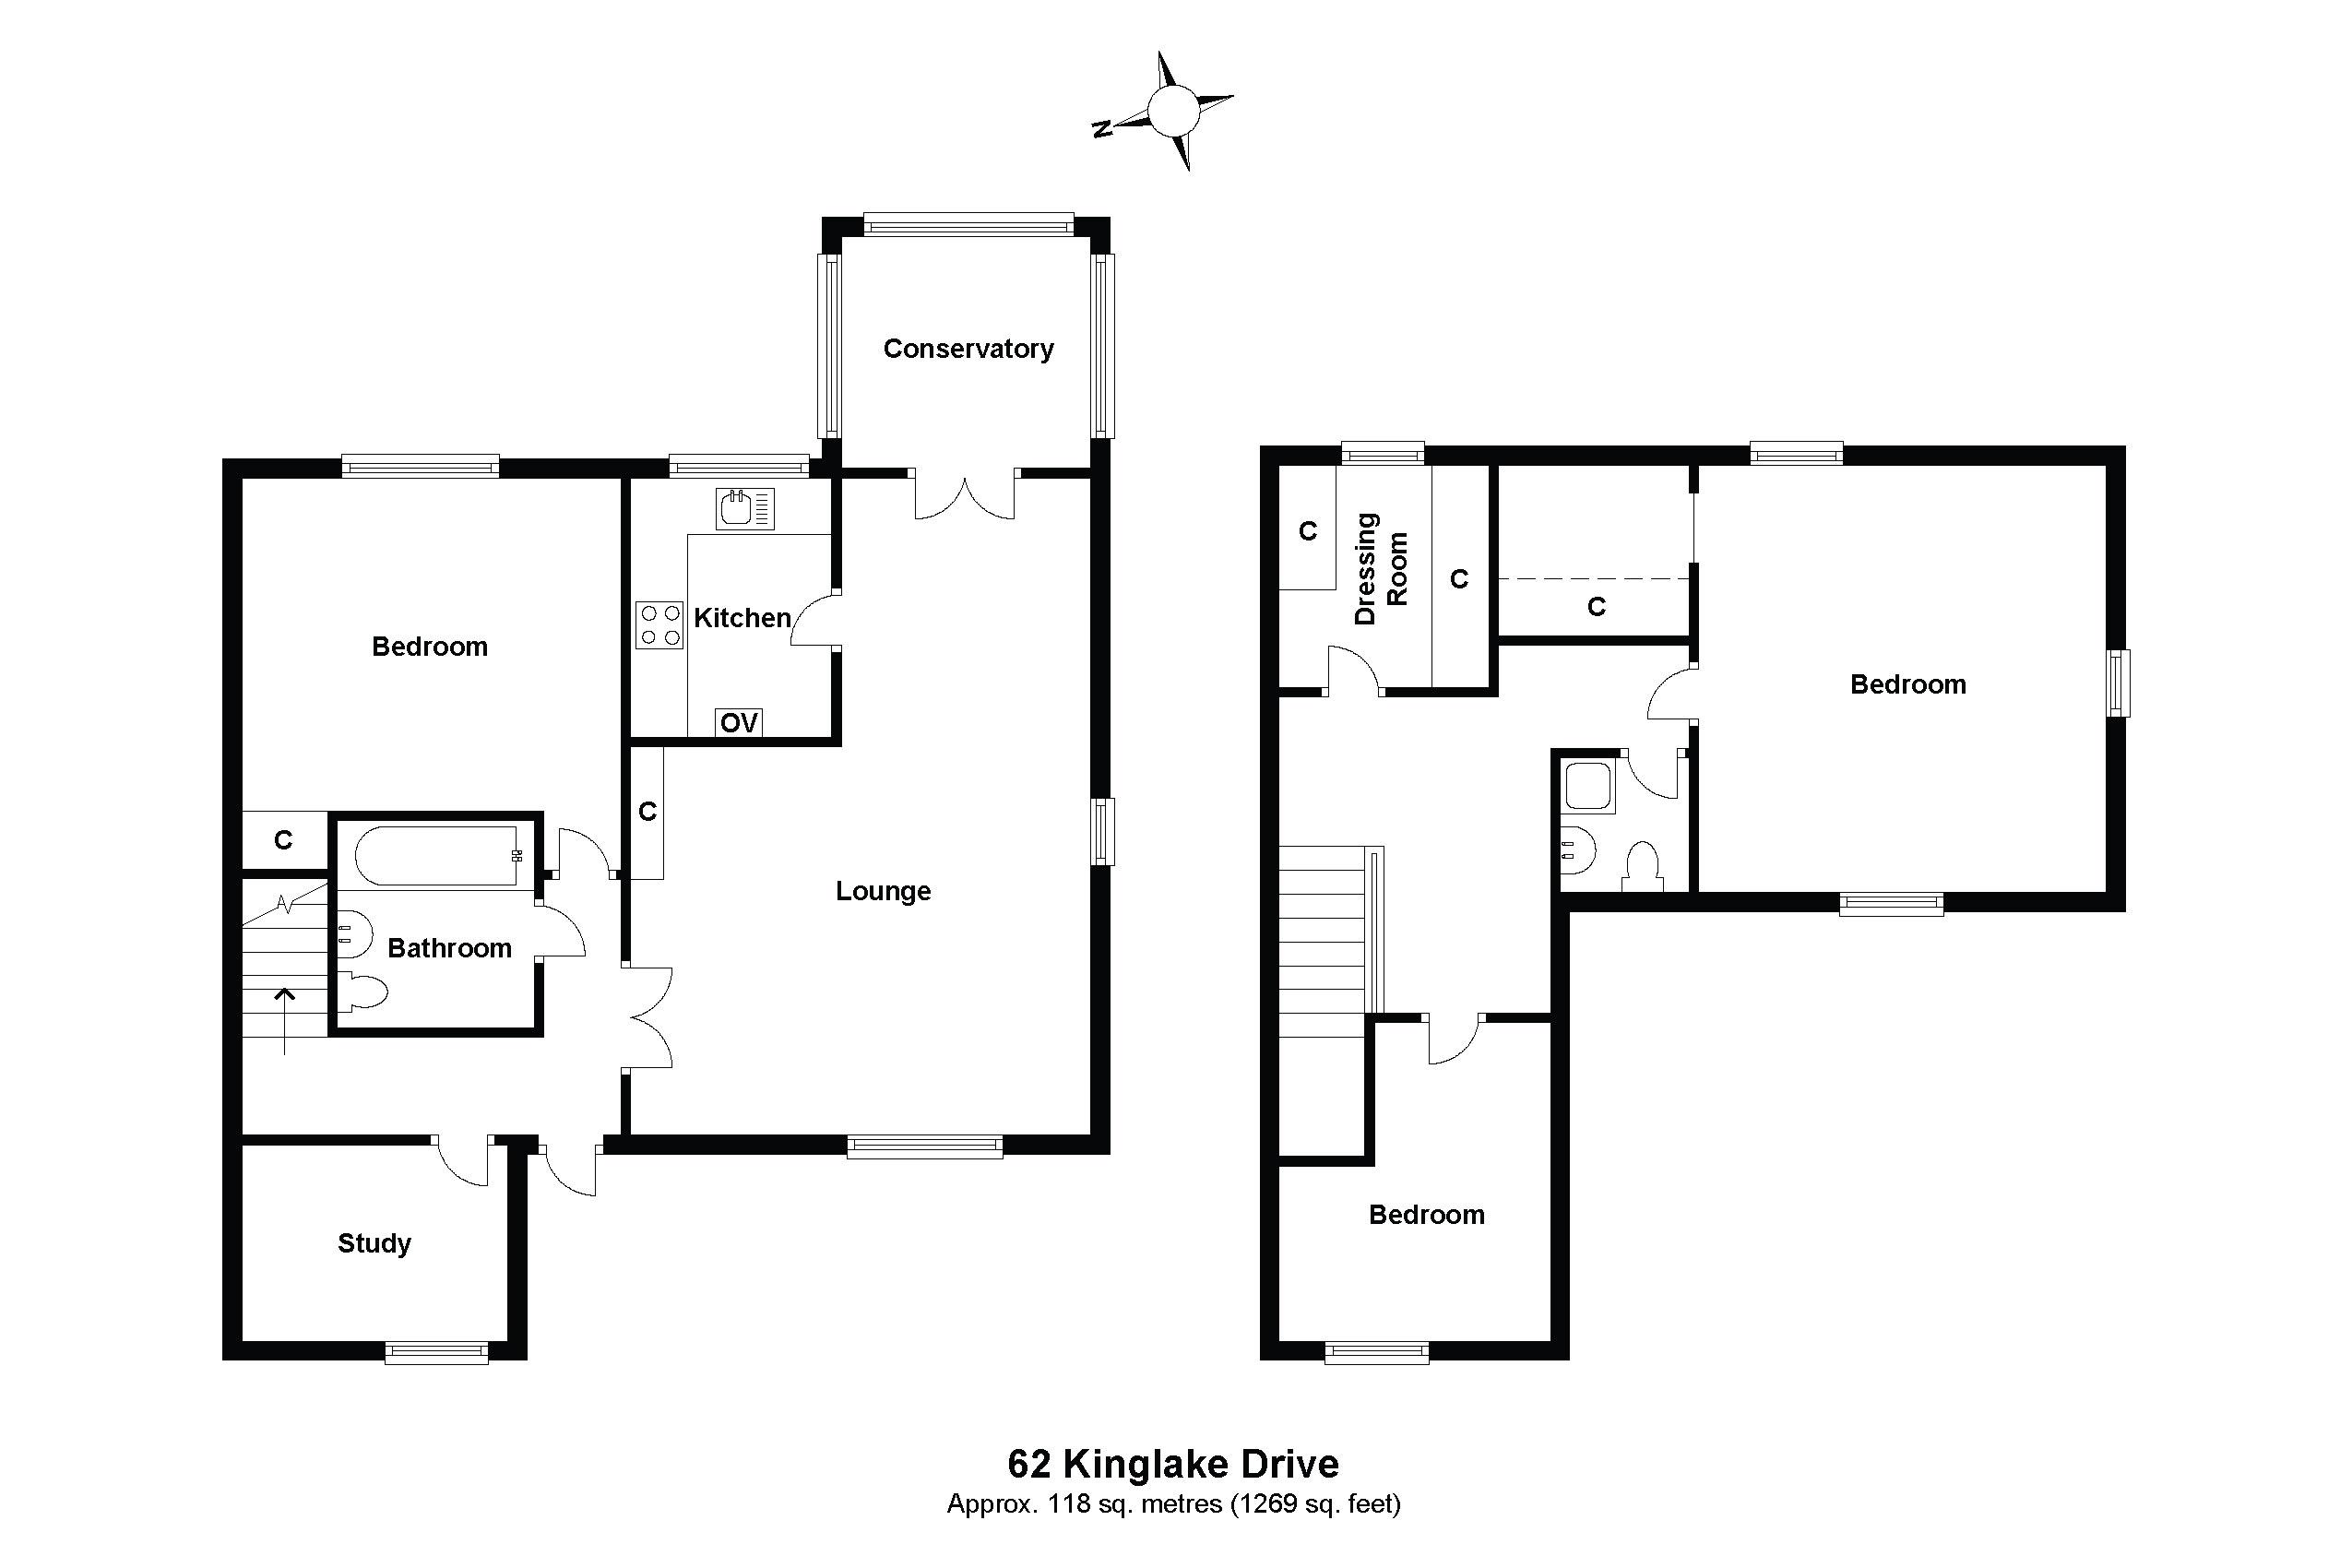 62 Kinglake Drive Floorplan